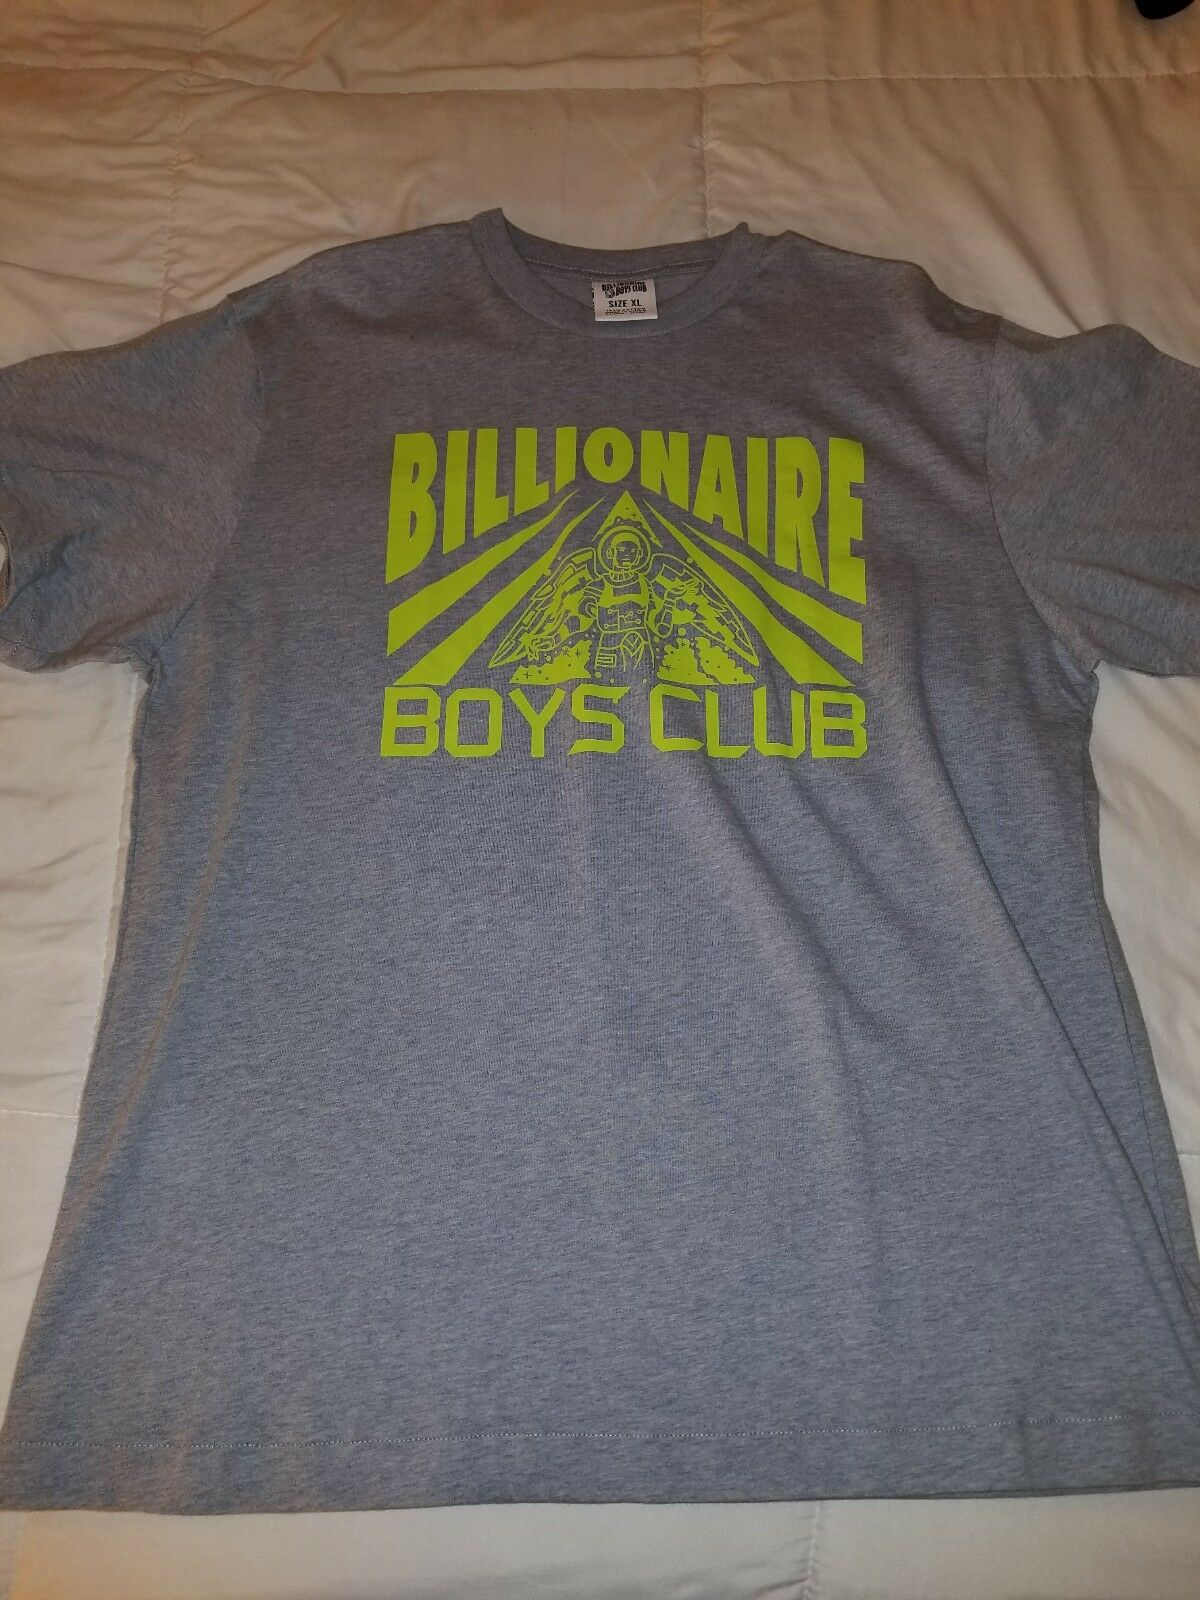 BILLIONAIRE BOYS CLUB T SHIRT SIZE XL